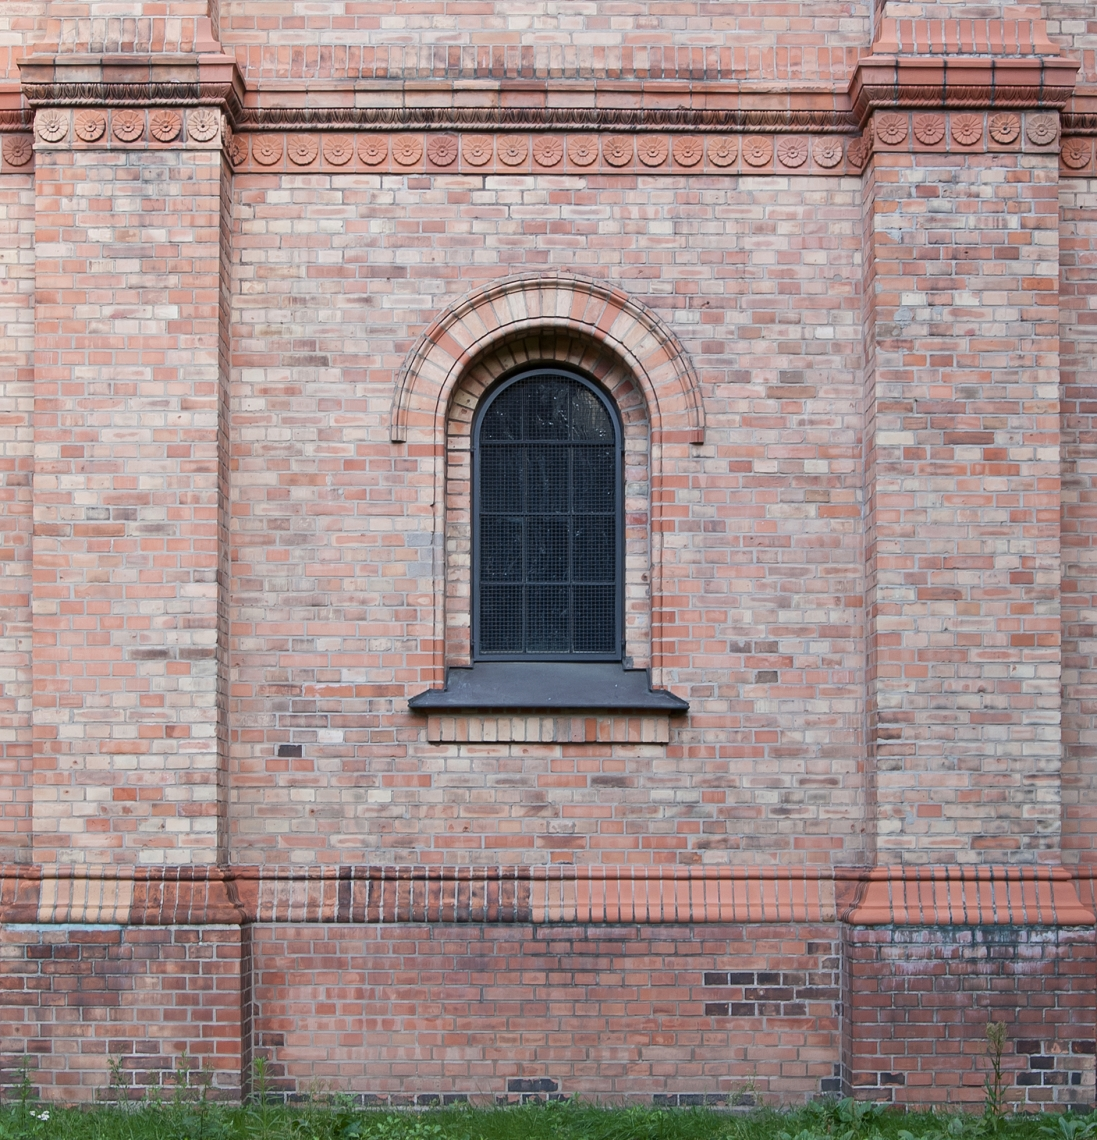 Windows Ornate_0063